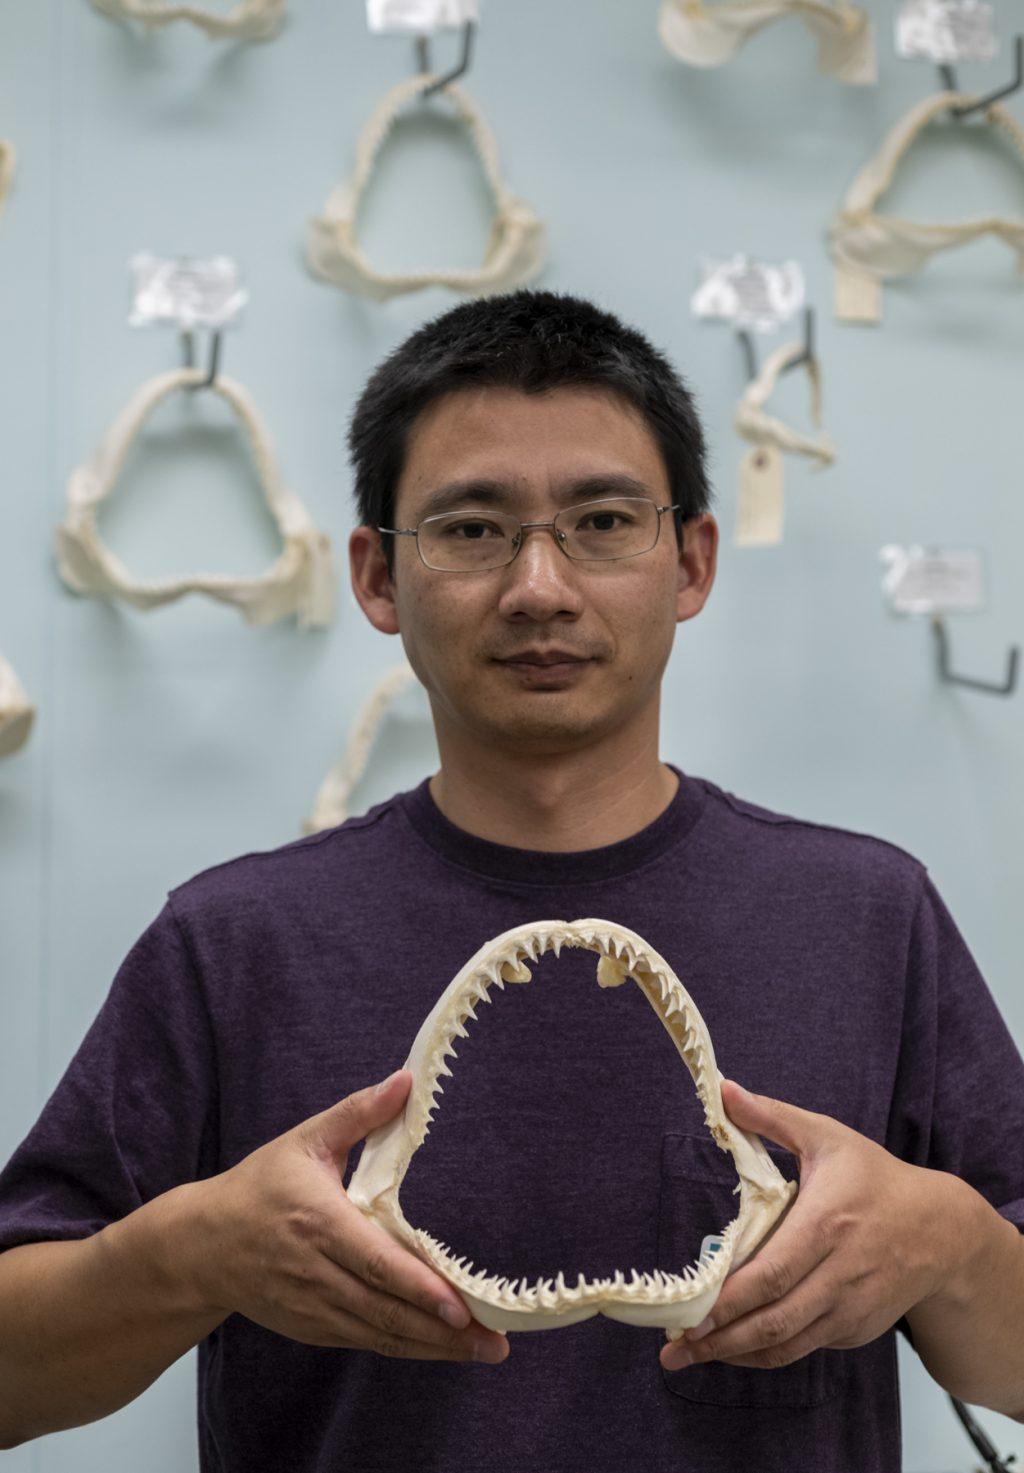 man in purple shirt holding shark jaws